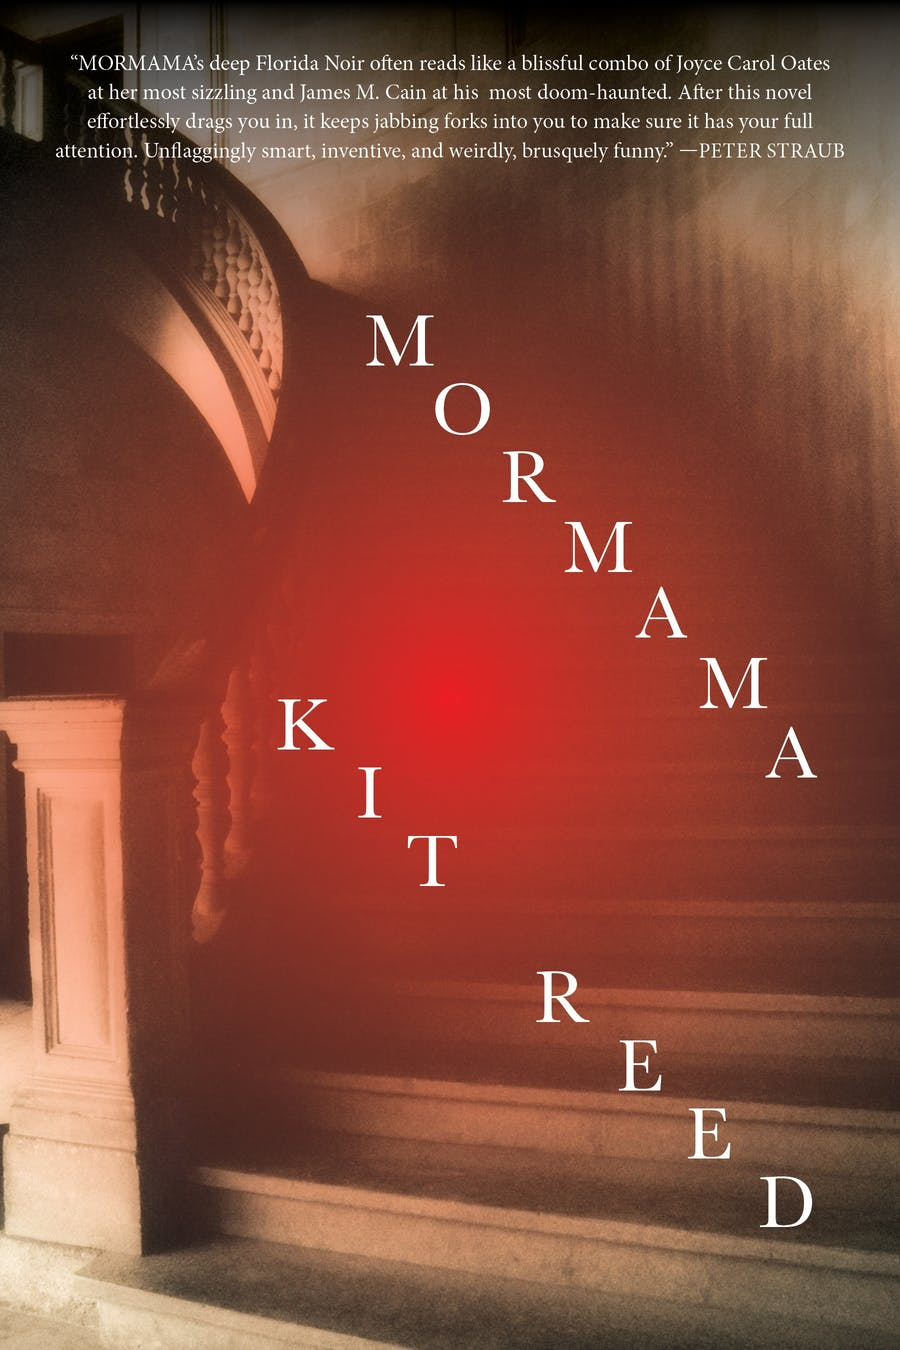 Mormama by Kit Reed